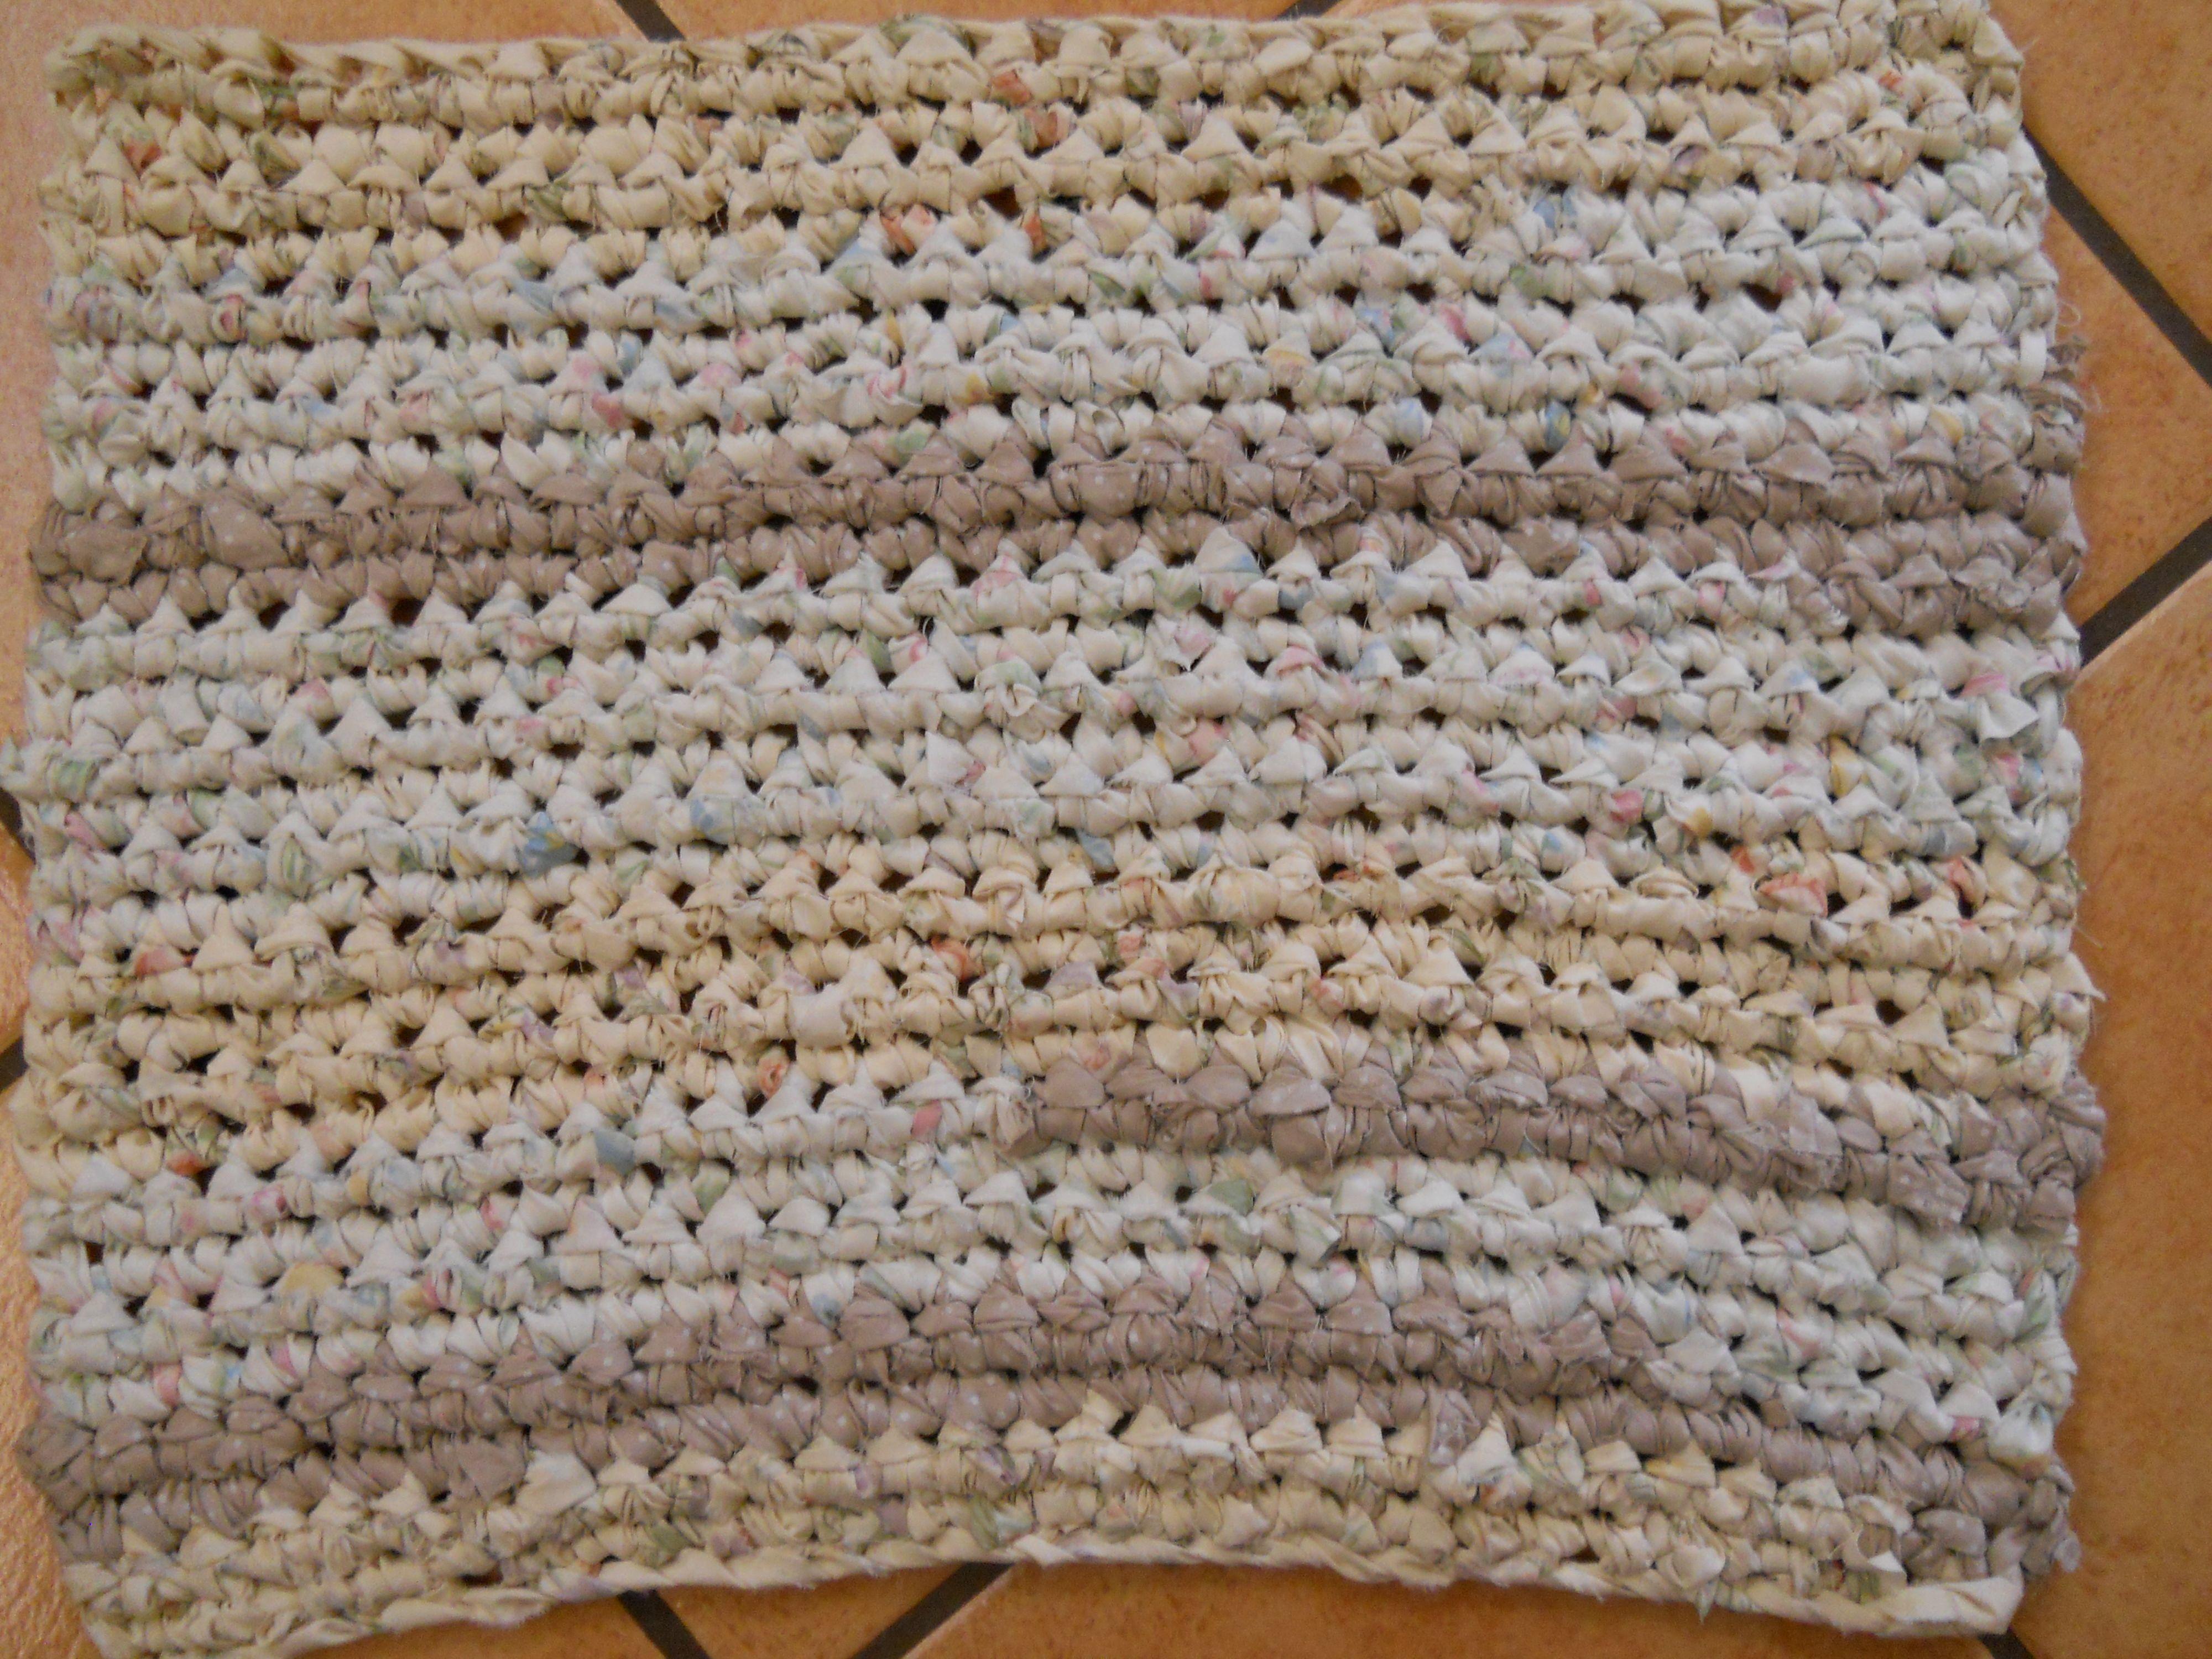 This Is A Neutral Runner Rag Rug Easiest Of All Rag Rugs To Crochet Erin Halvorsen Youtube Rag Rug Rugs Crochet Rug